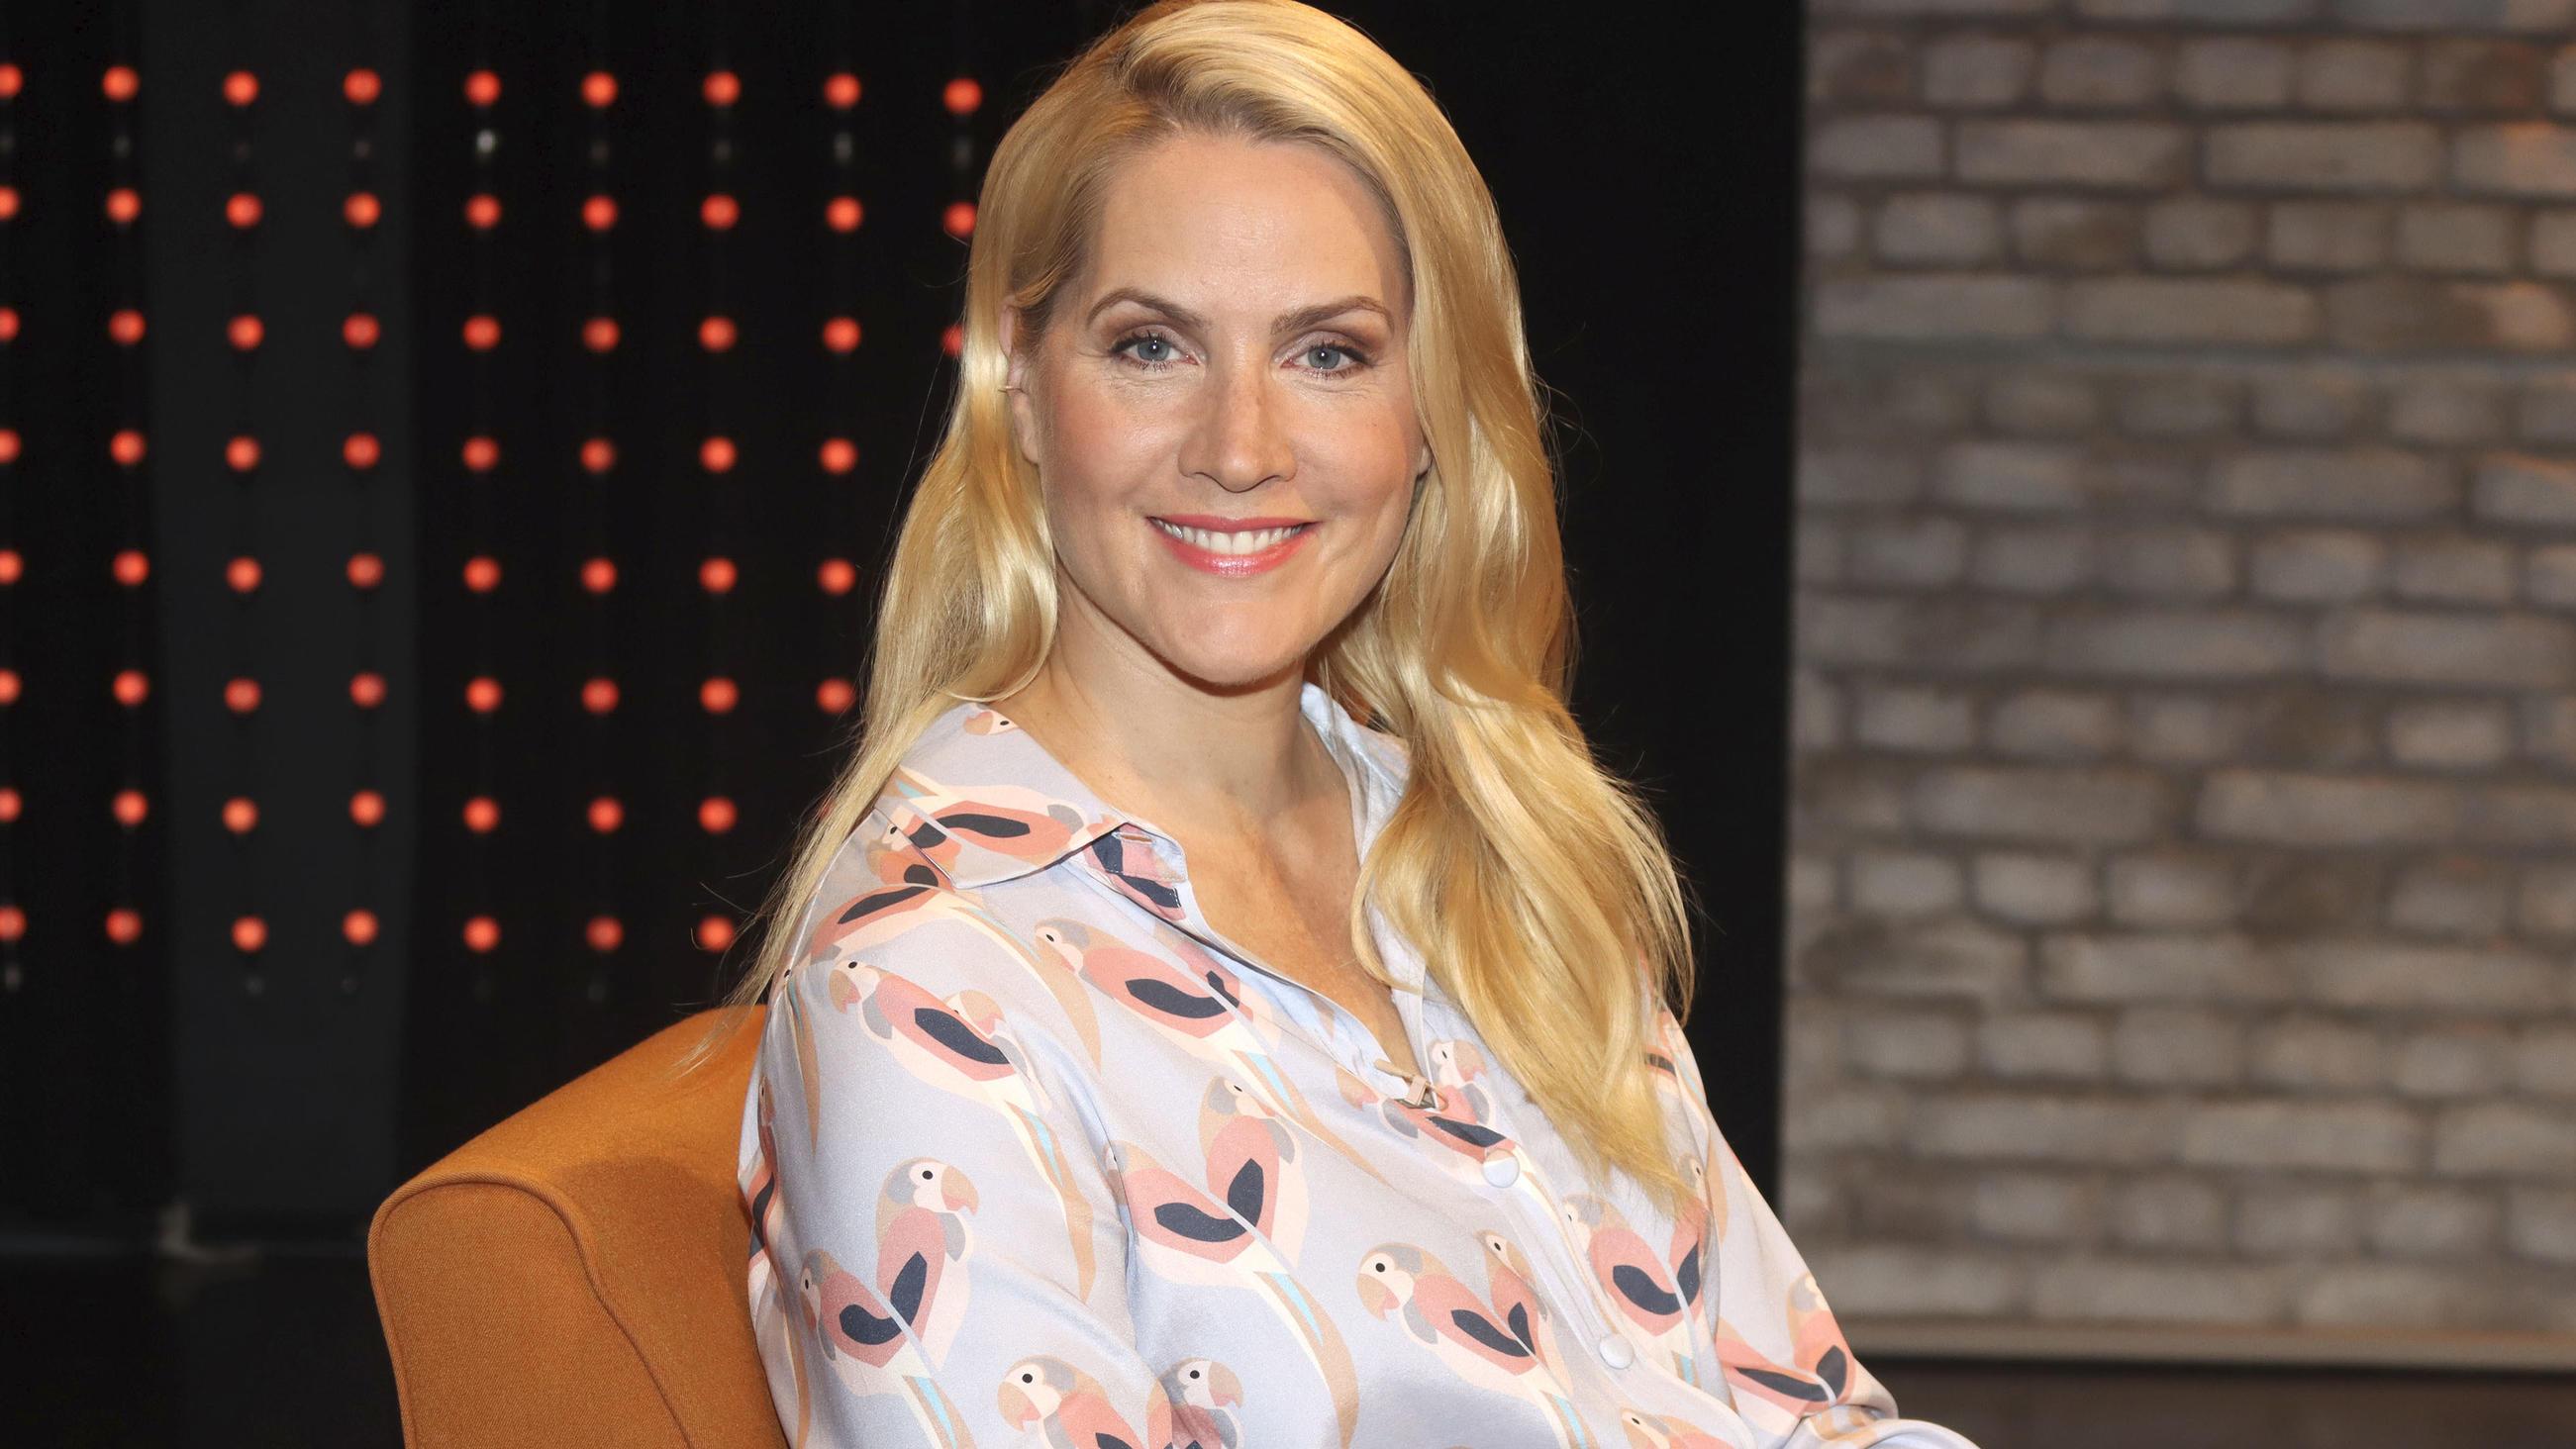 """Tagesschau""-Sprecherin Judith Rakers verpasst Show wegen 10-Stunden-Stau"